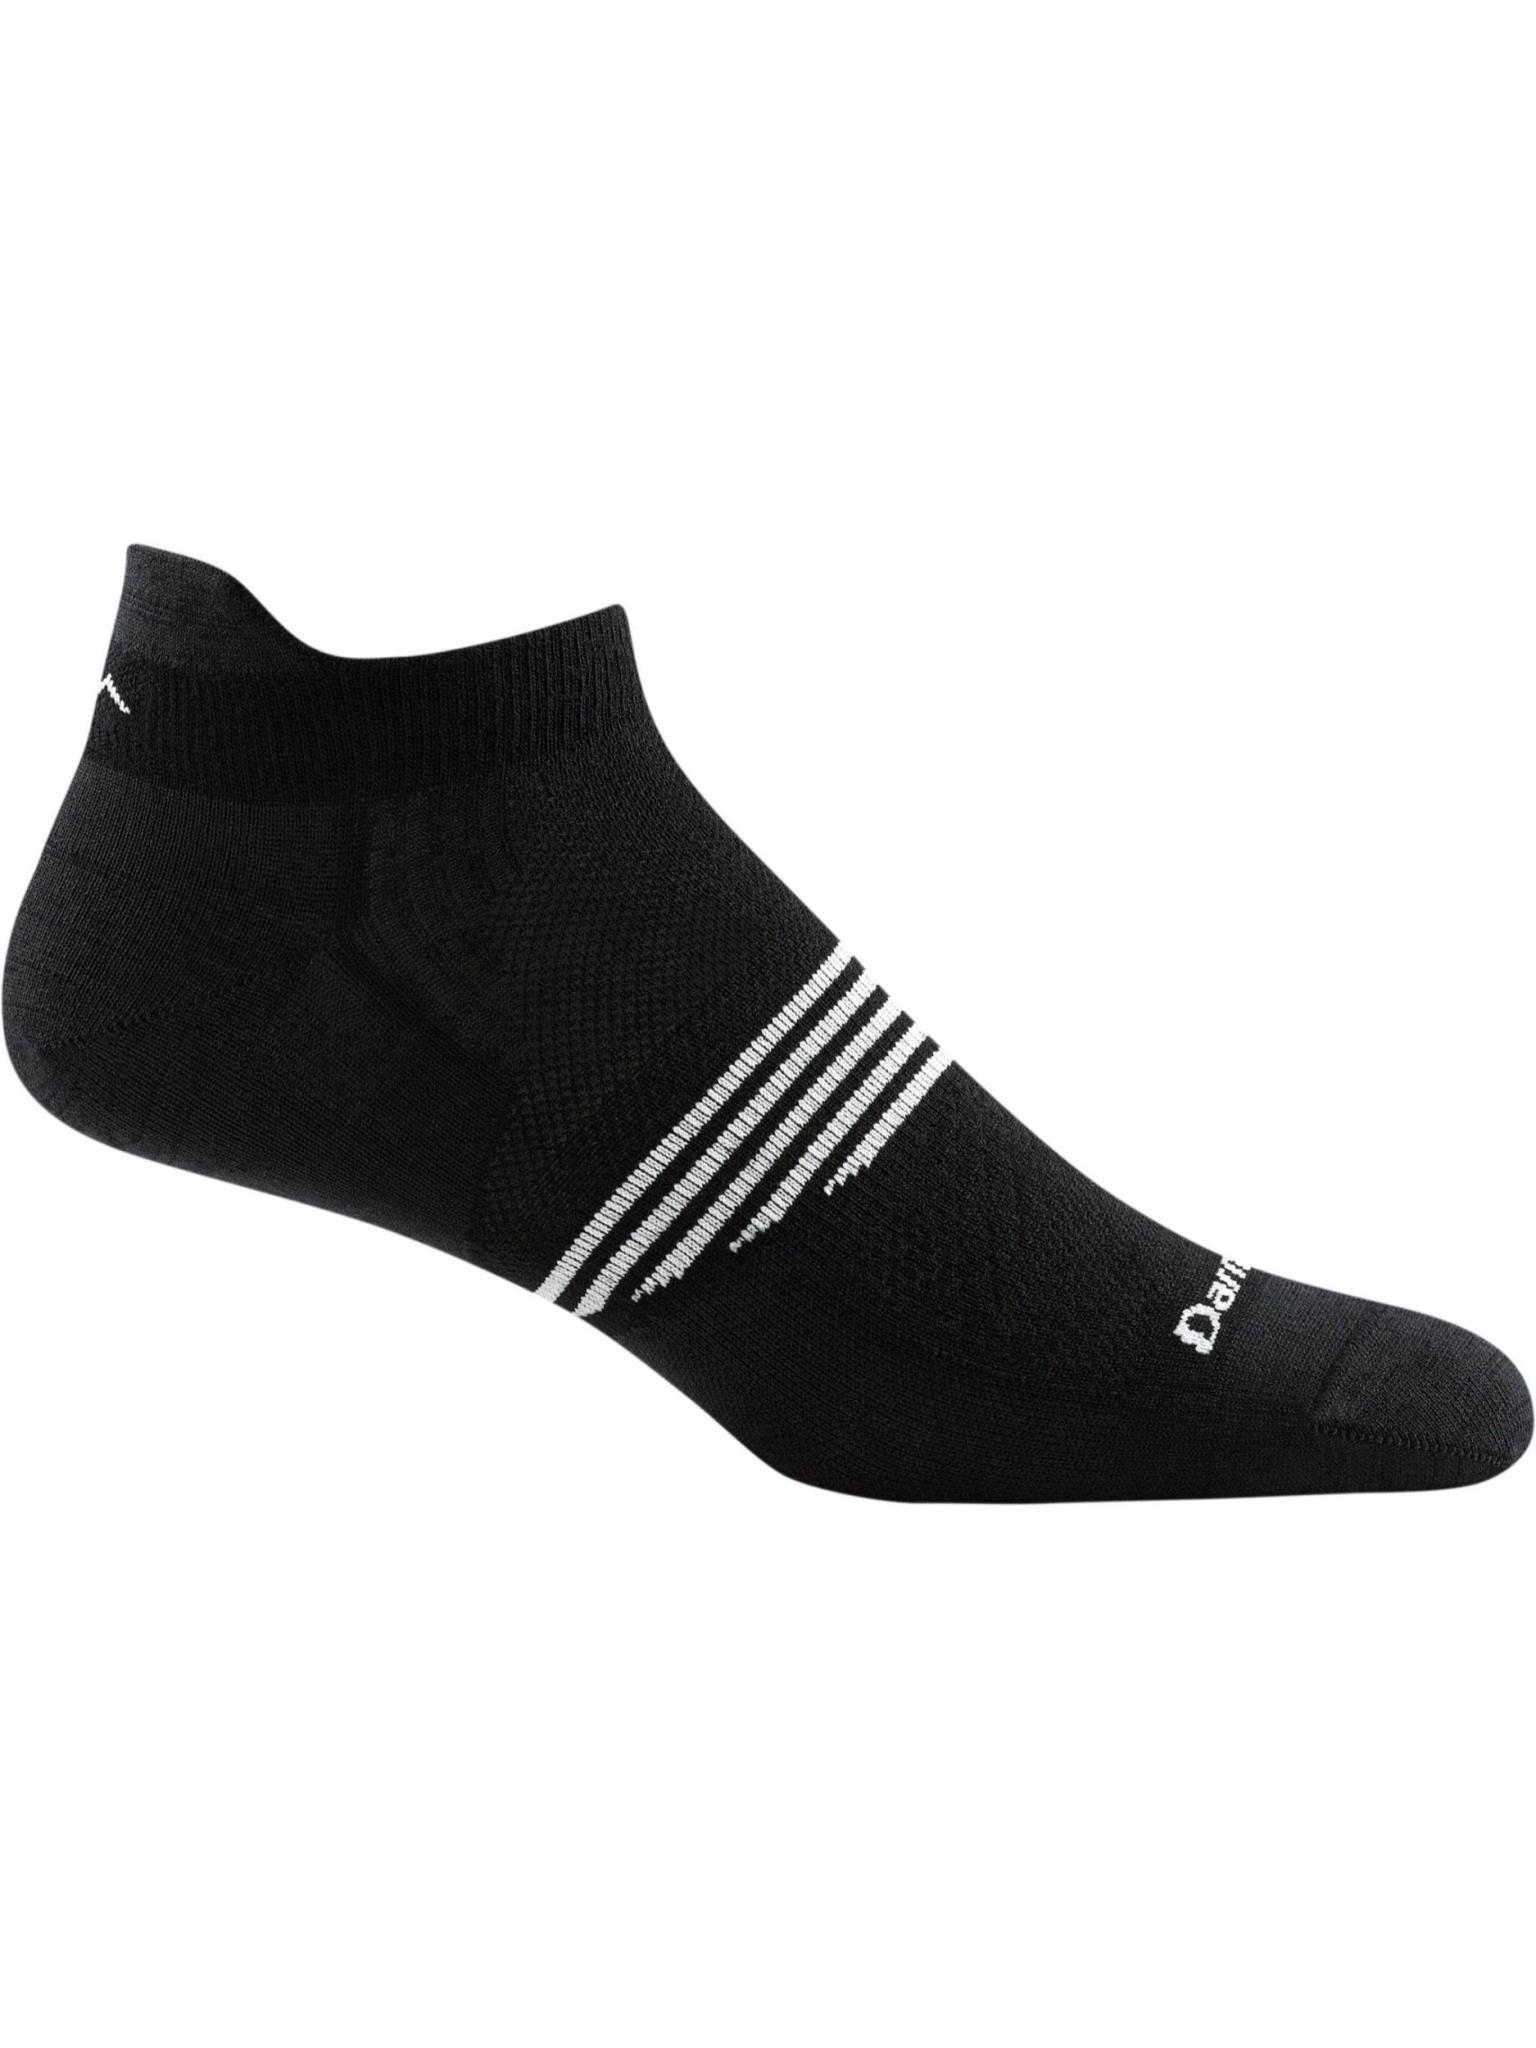 Darn Tough Men's Element Lightweight No Show Tab Sock